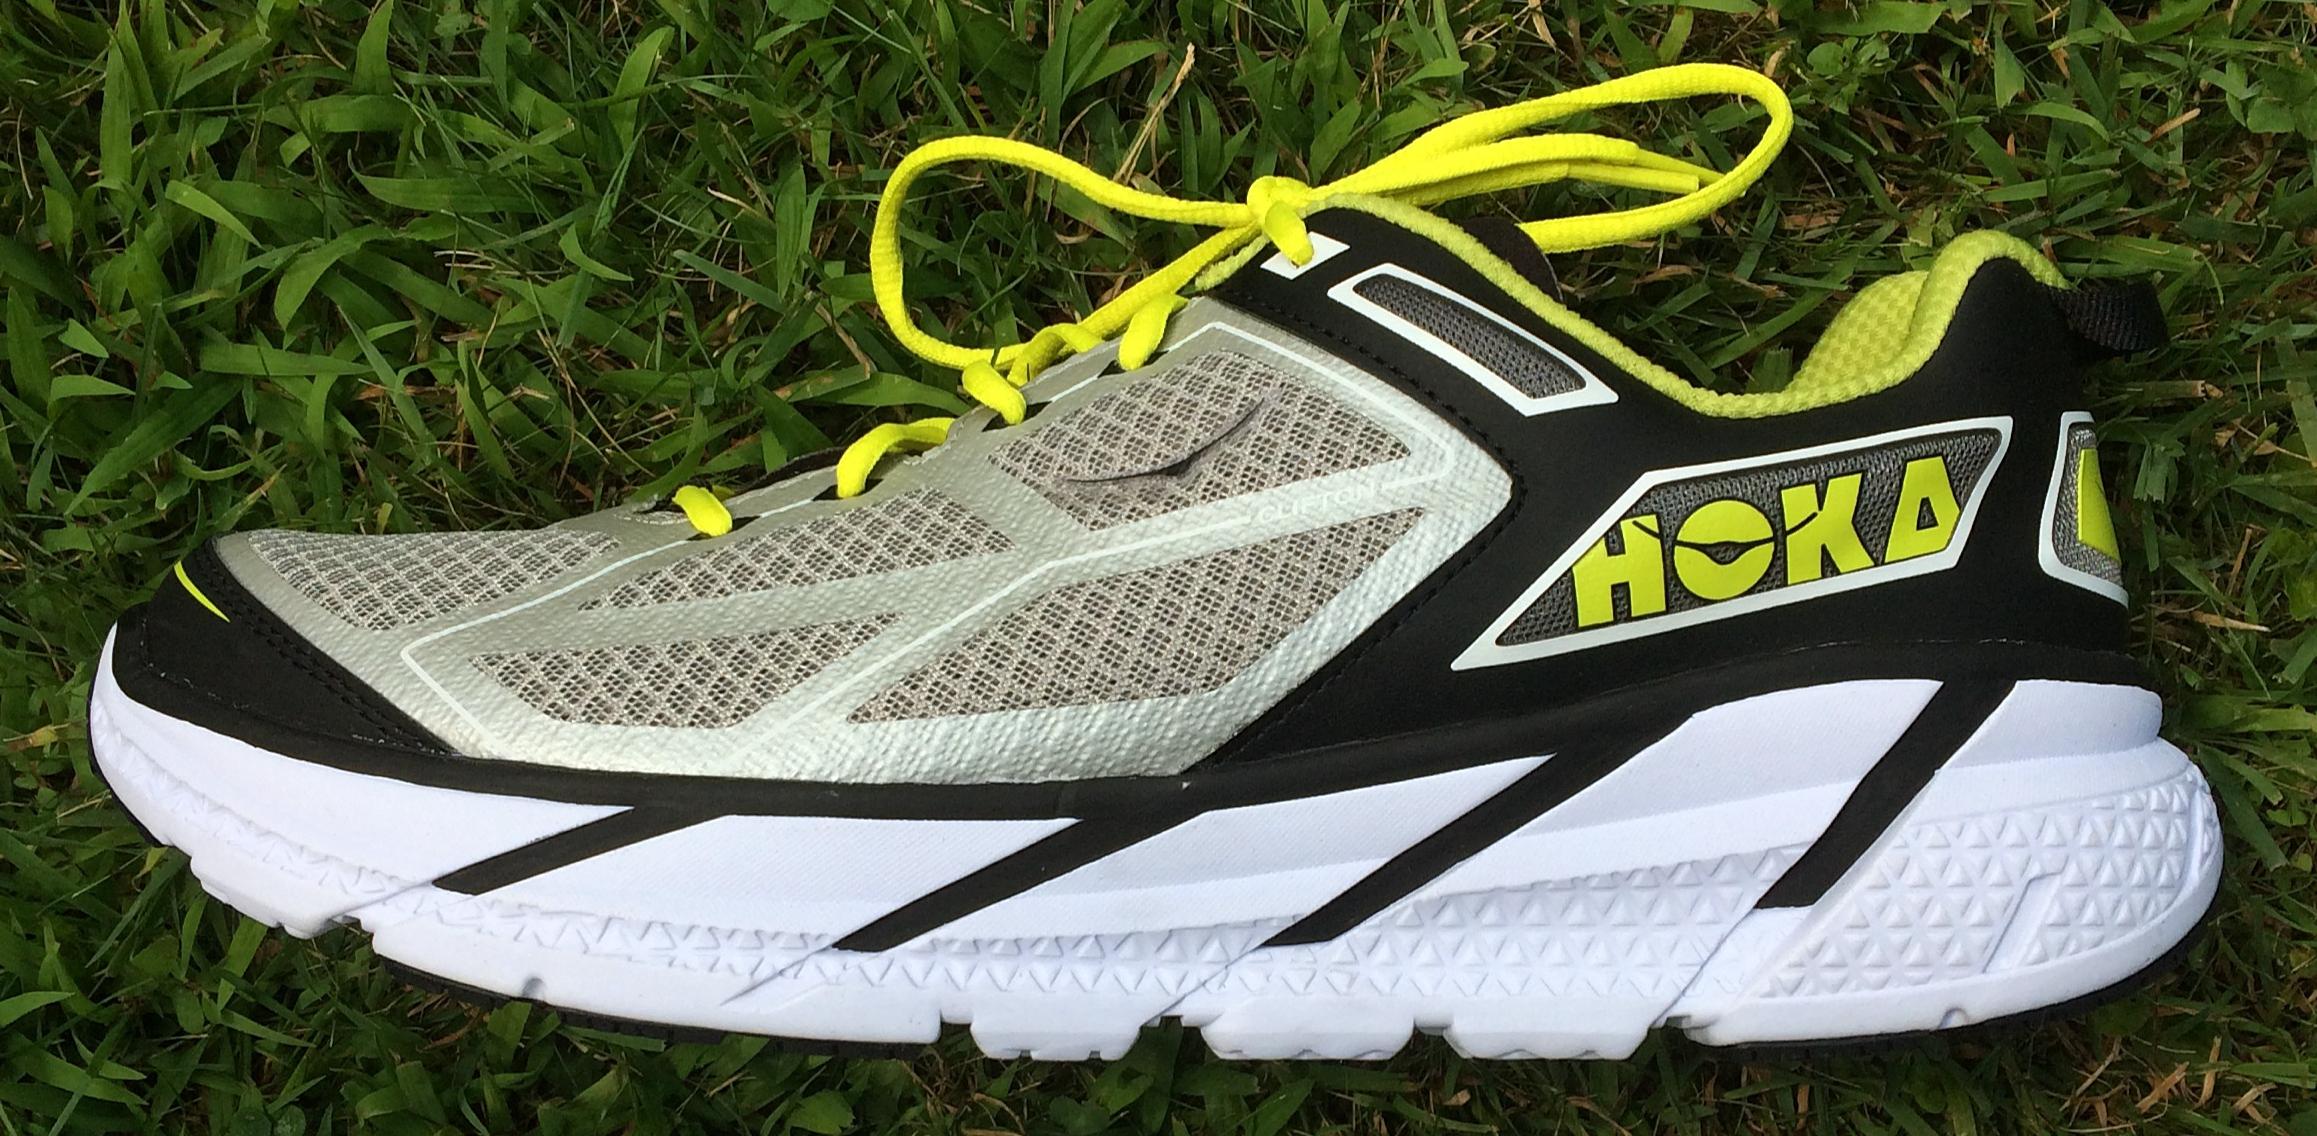 huge selection of 370e5 4ce28 Hoka Clifton Running Shoe Review